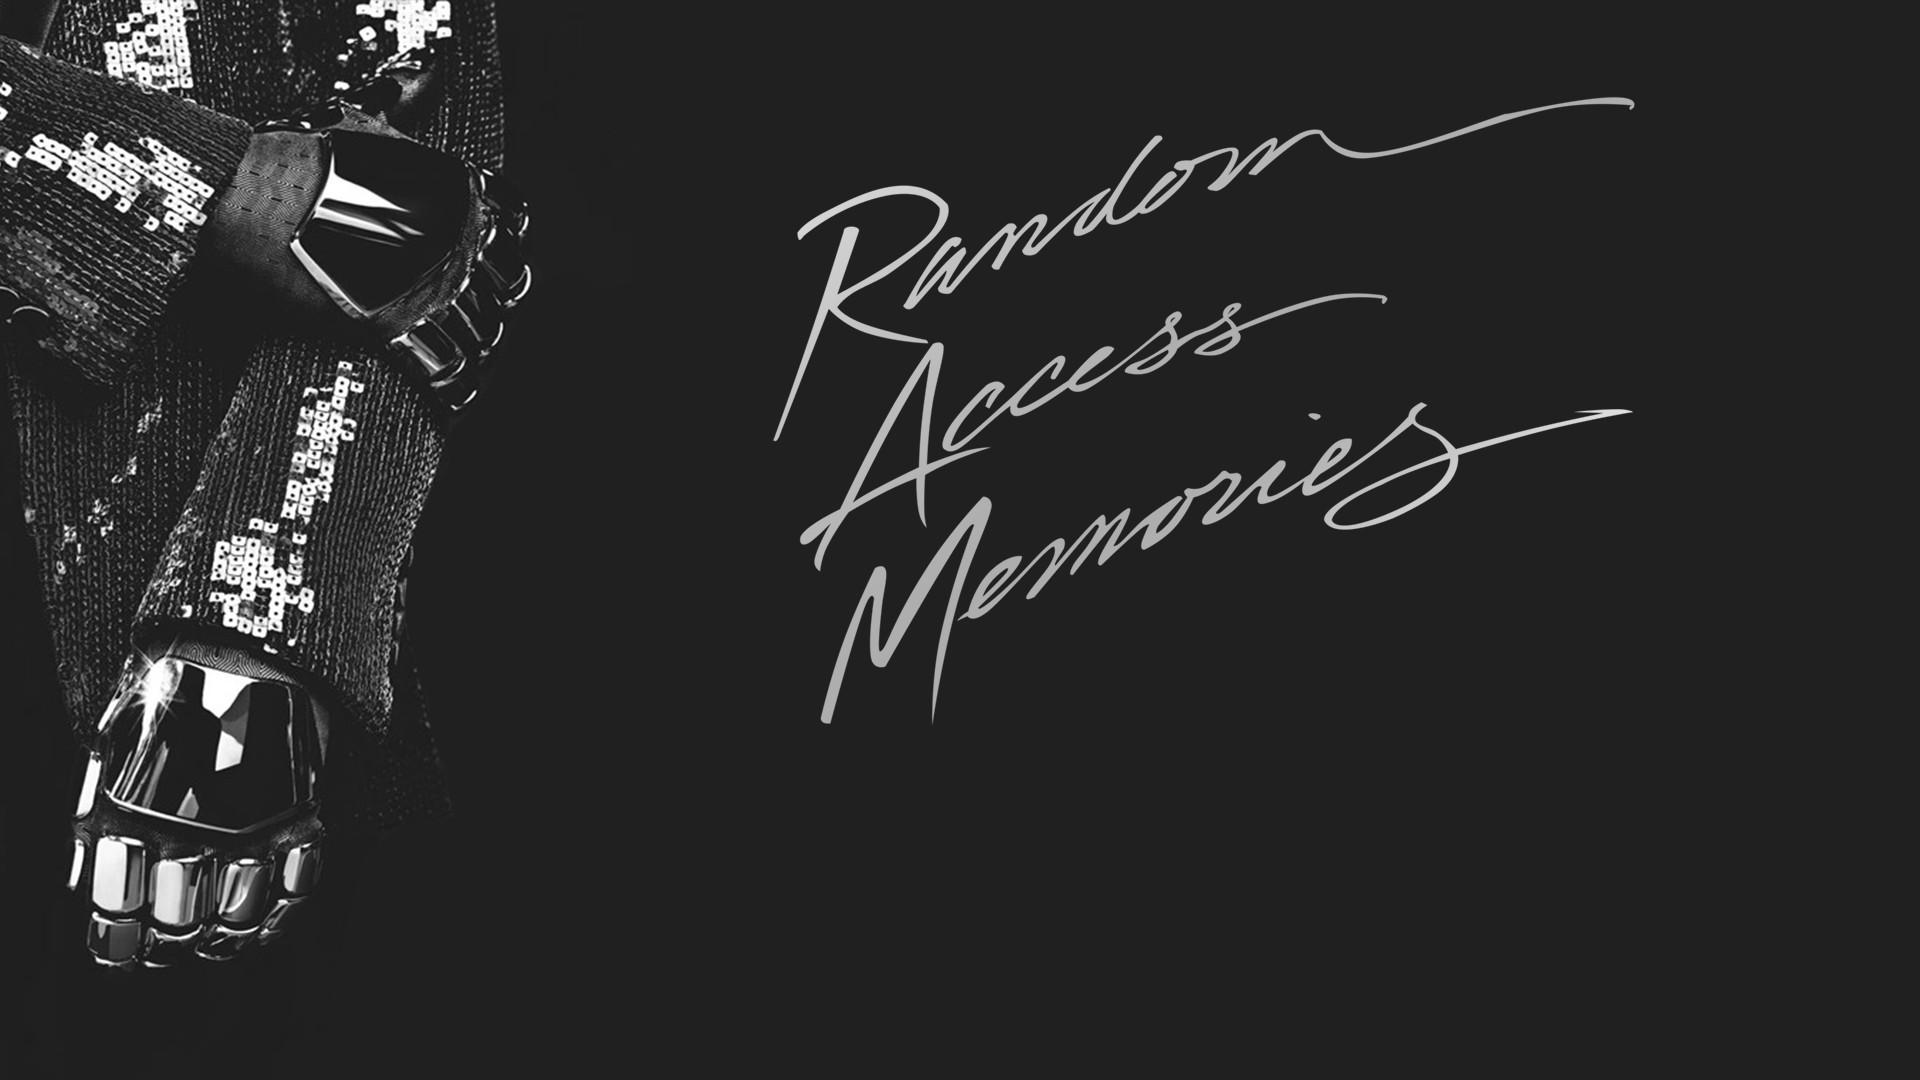 Daft Punk Wallpapers Random Access Memories Wide | Amazing Wallpapers |  Pinterest | Daft punk and Wallpaper